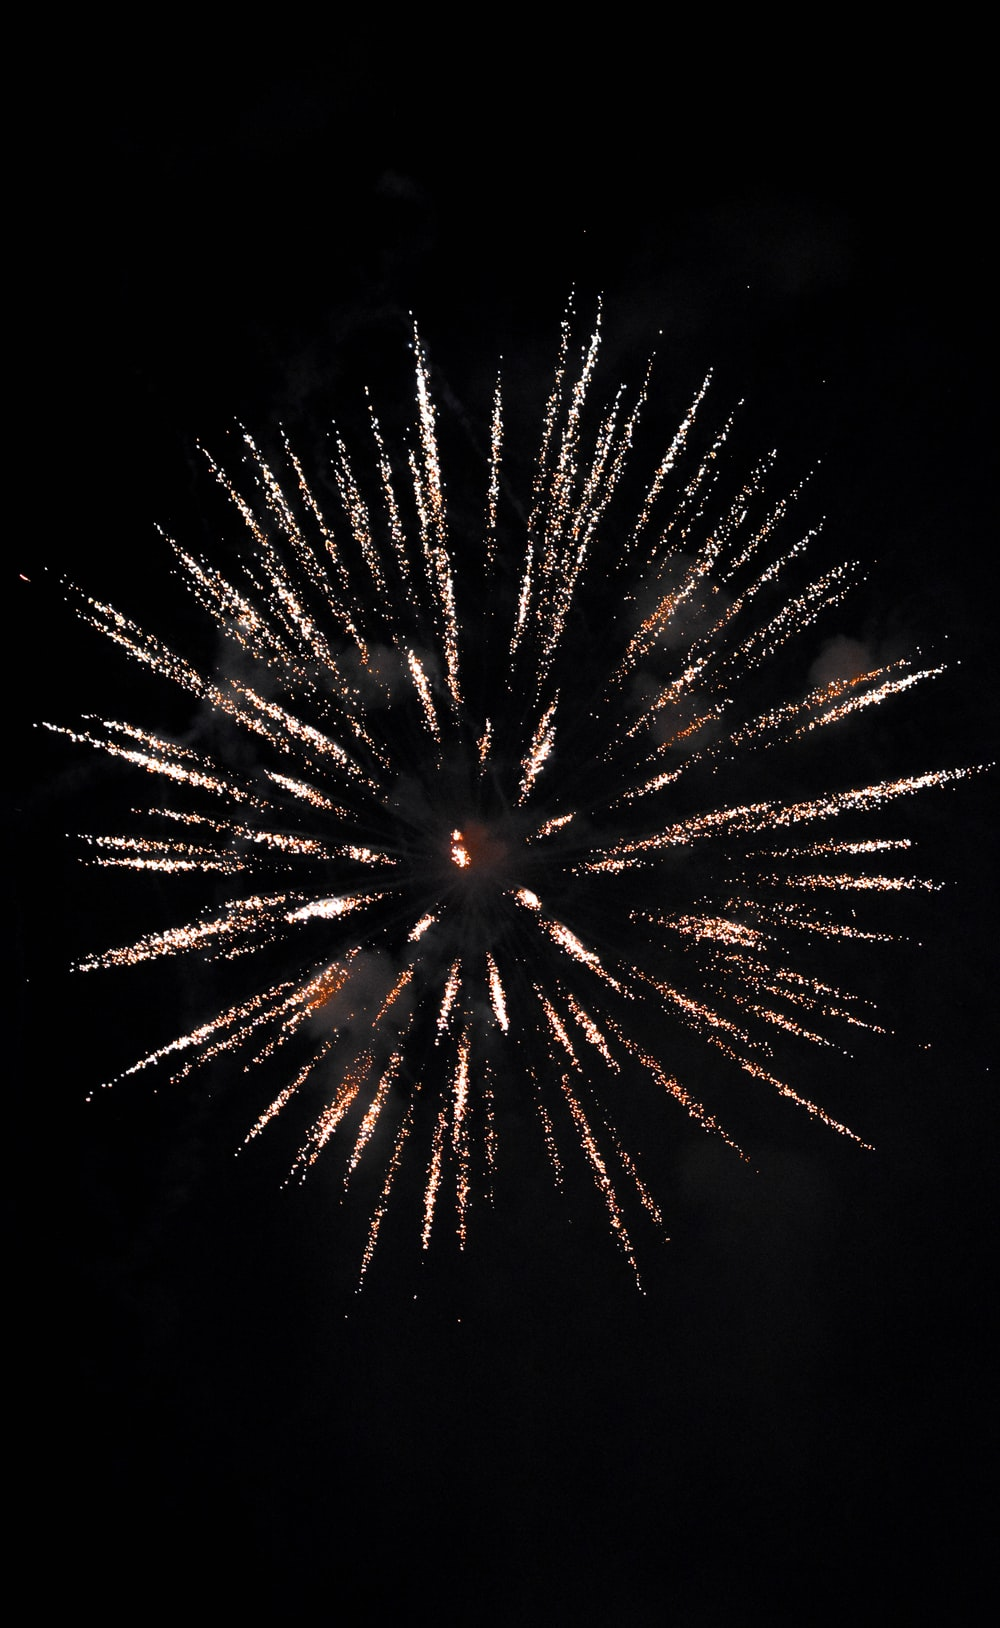 500 Fireworks Pictures Download Free Images On Unsplash